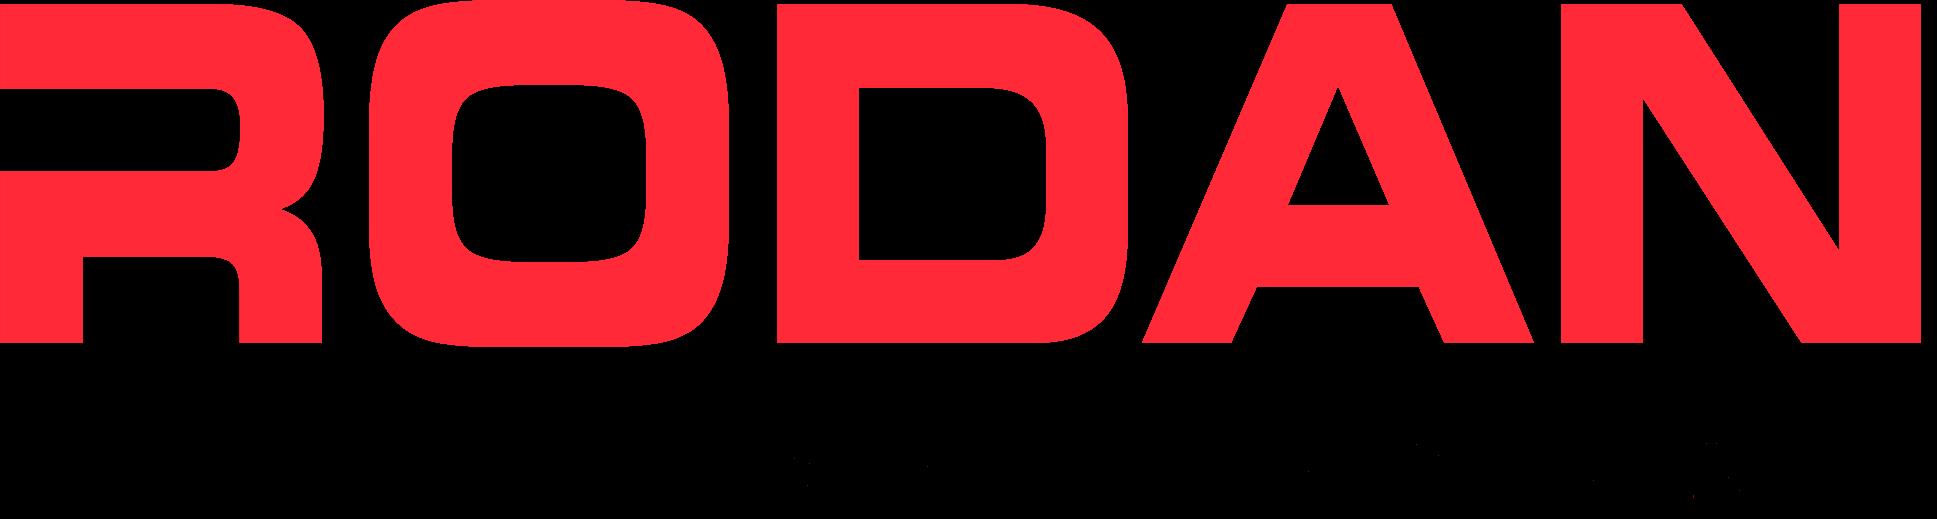 rodan_logo_red